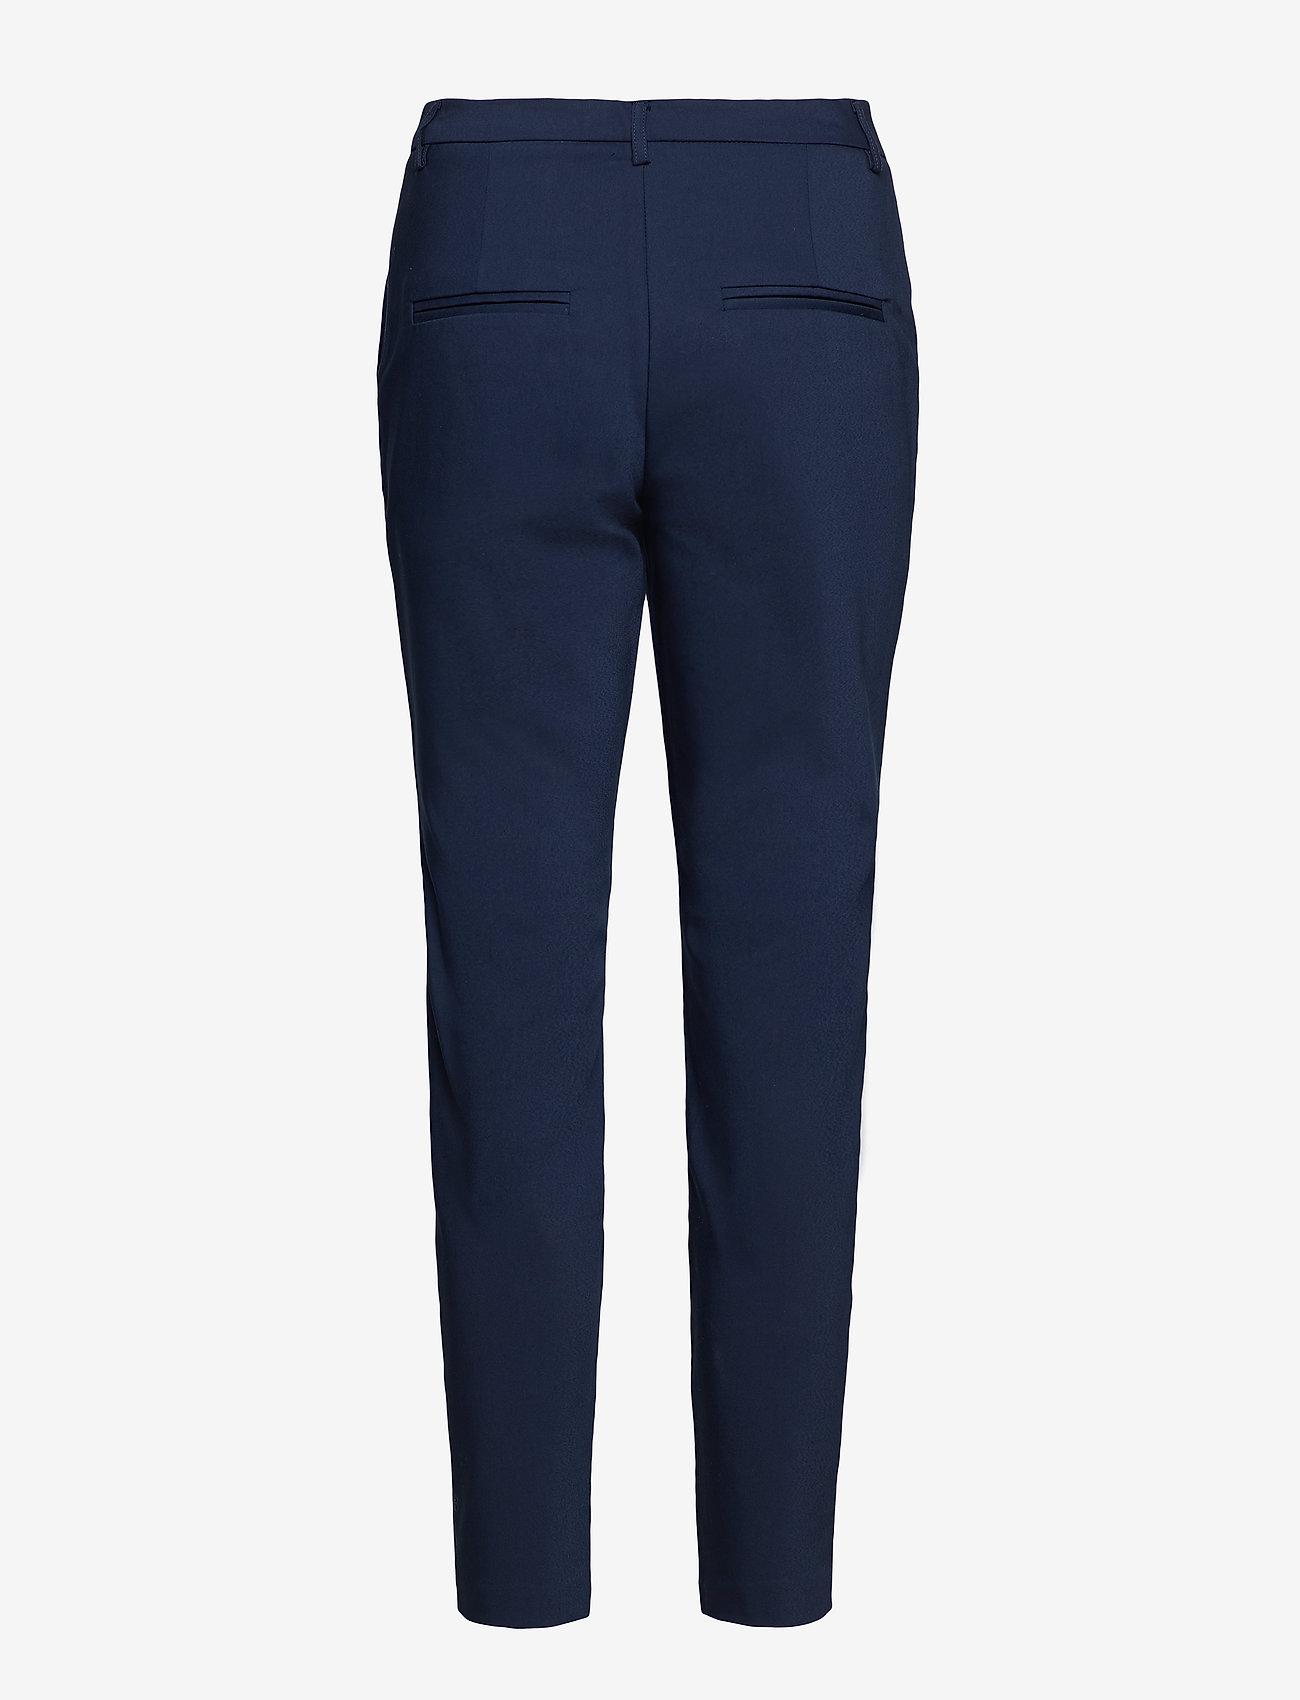 Vila - VIADELIA RWSL 7/8 NEW PANT-NOOS - straight leg trousers - navy blazer - 1